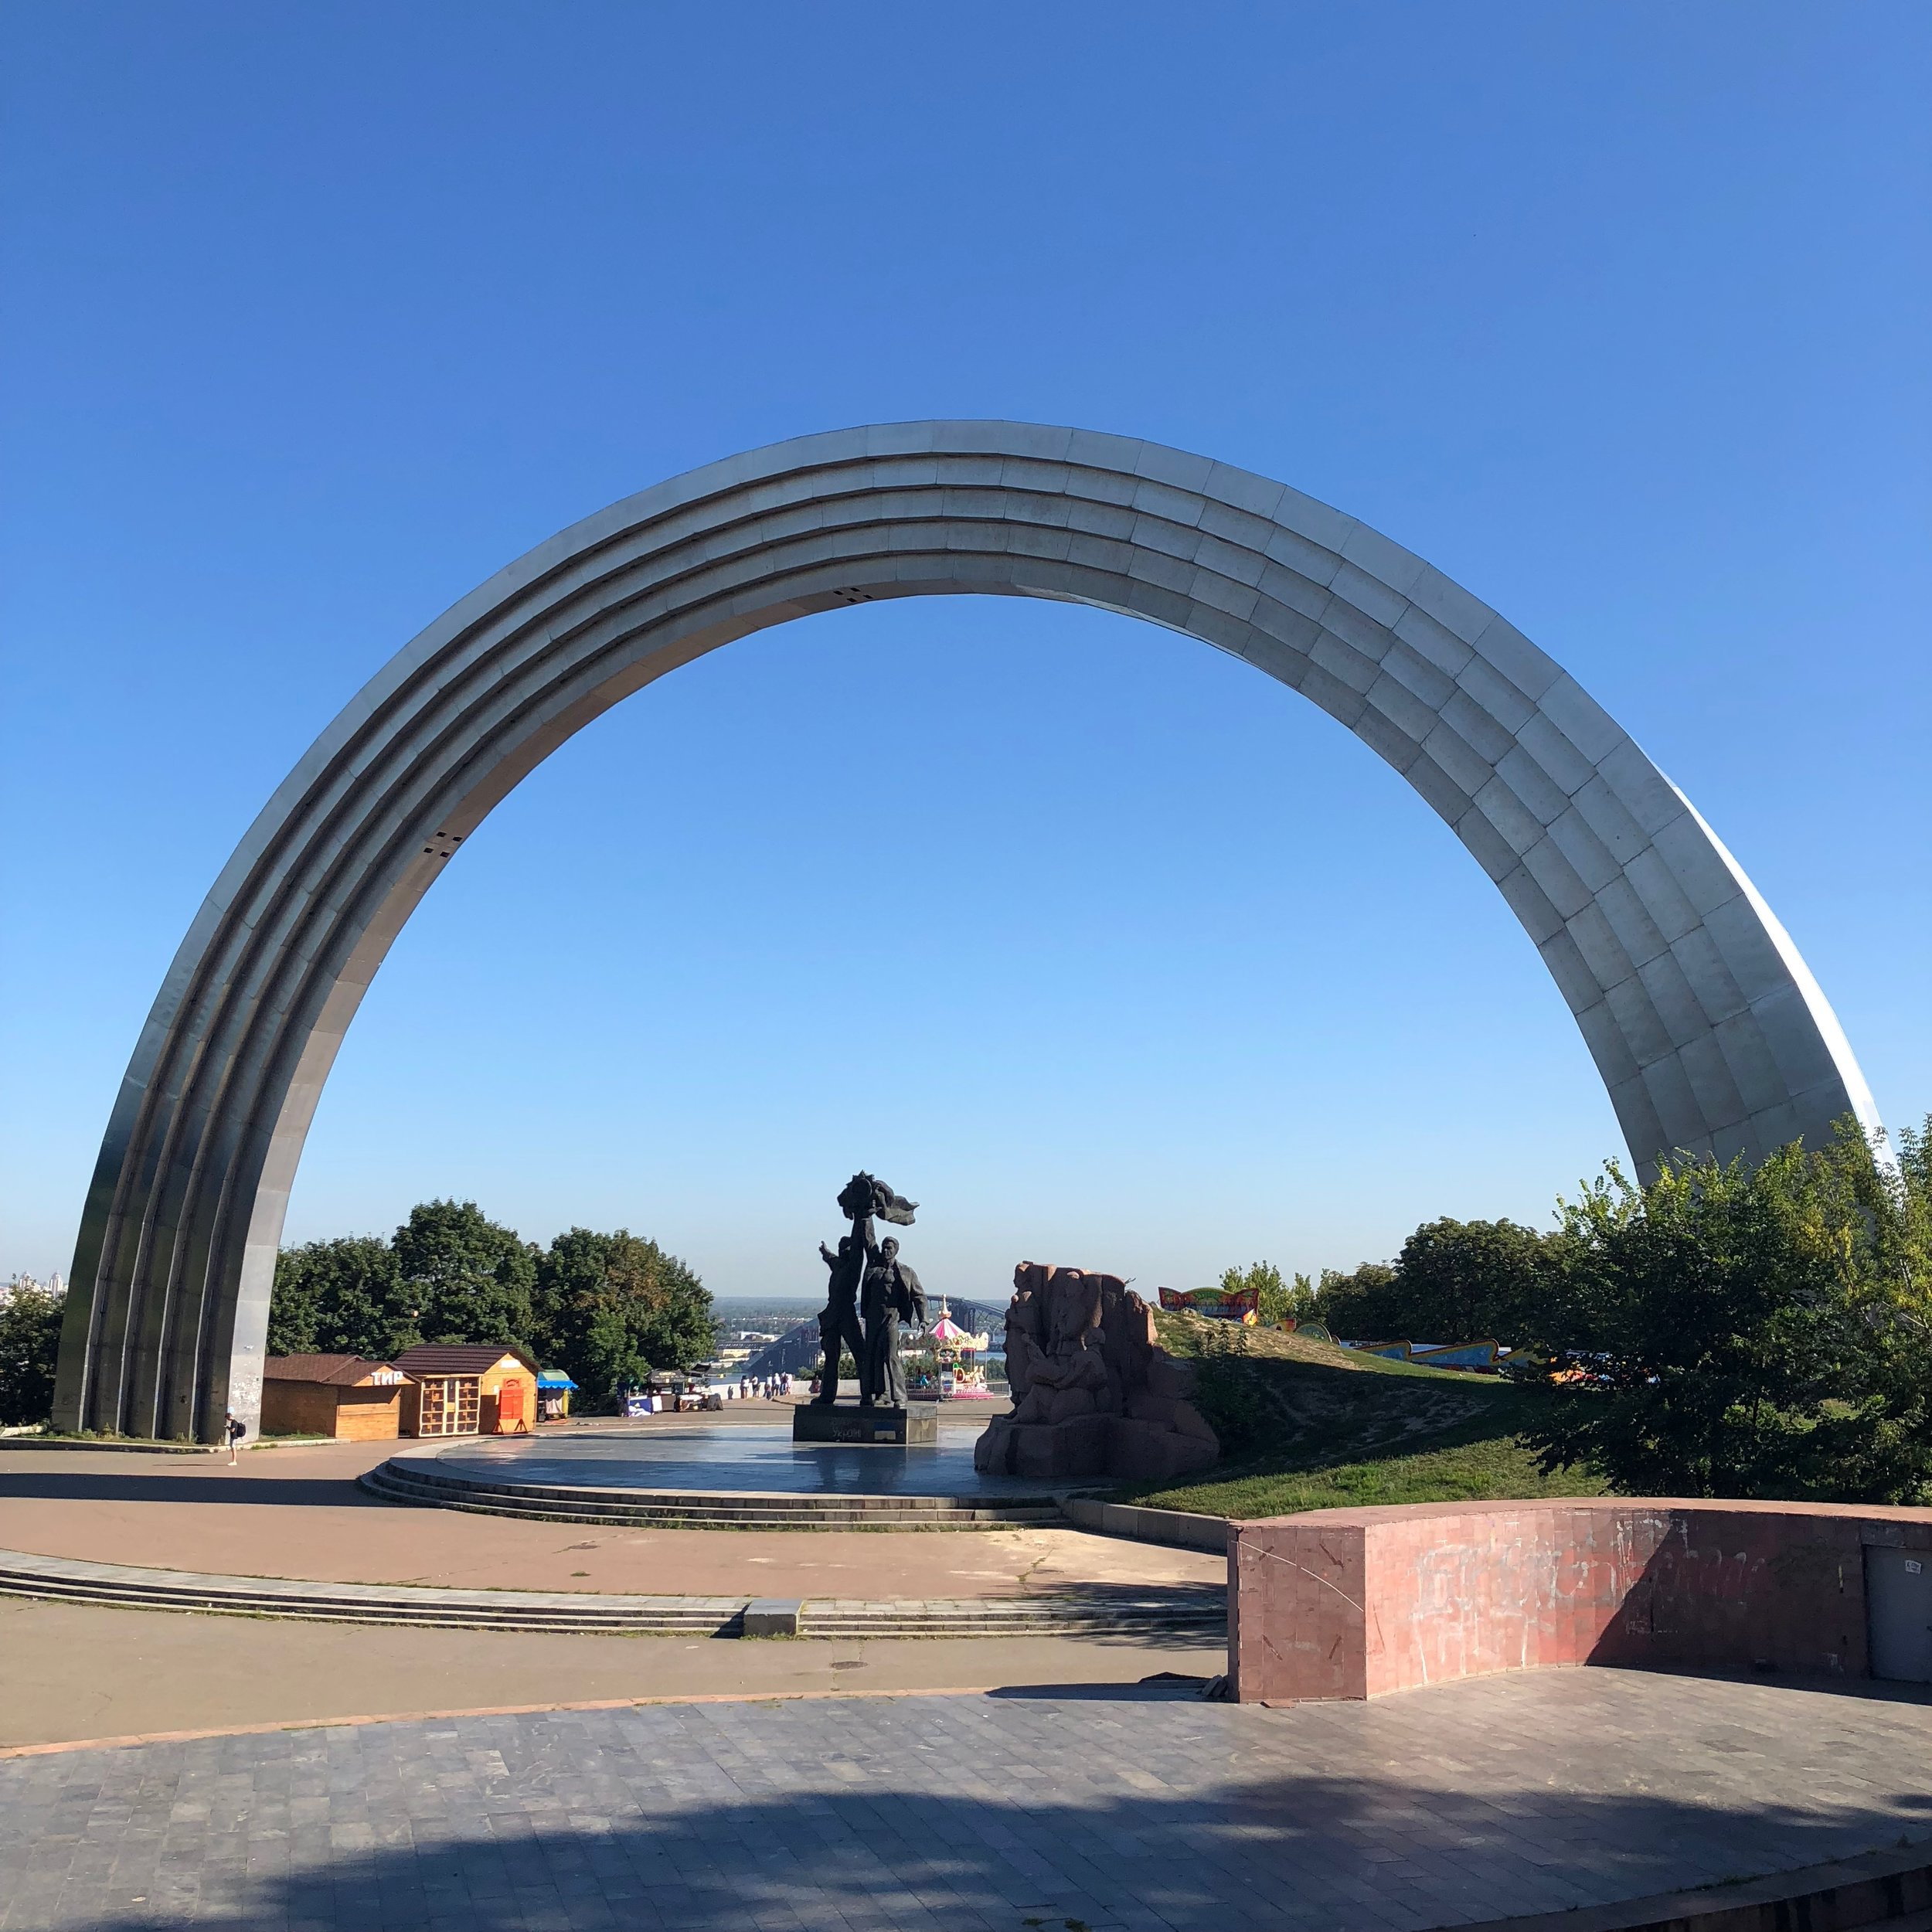 Friendship of Nations Arch - Kiev, Ukraine